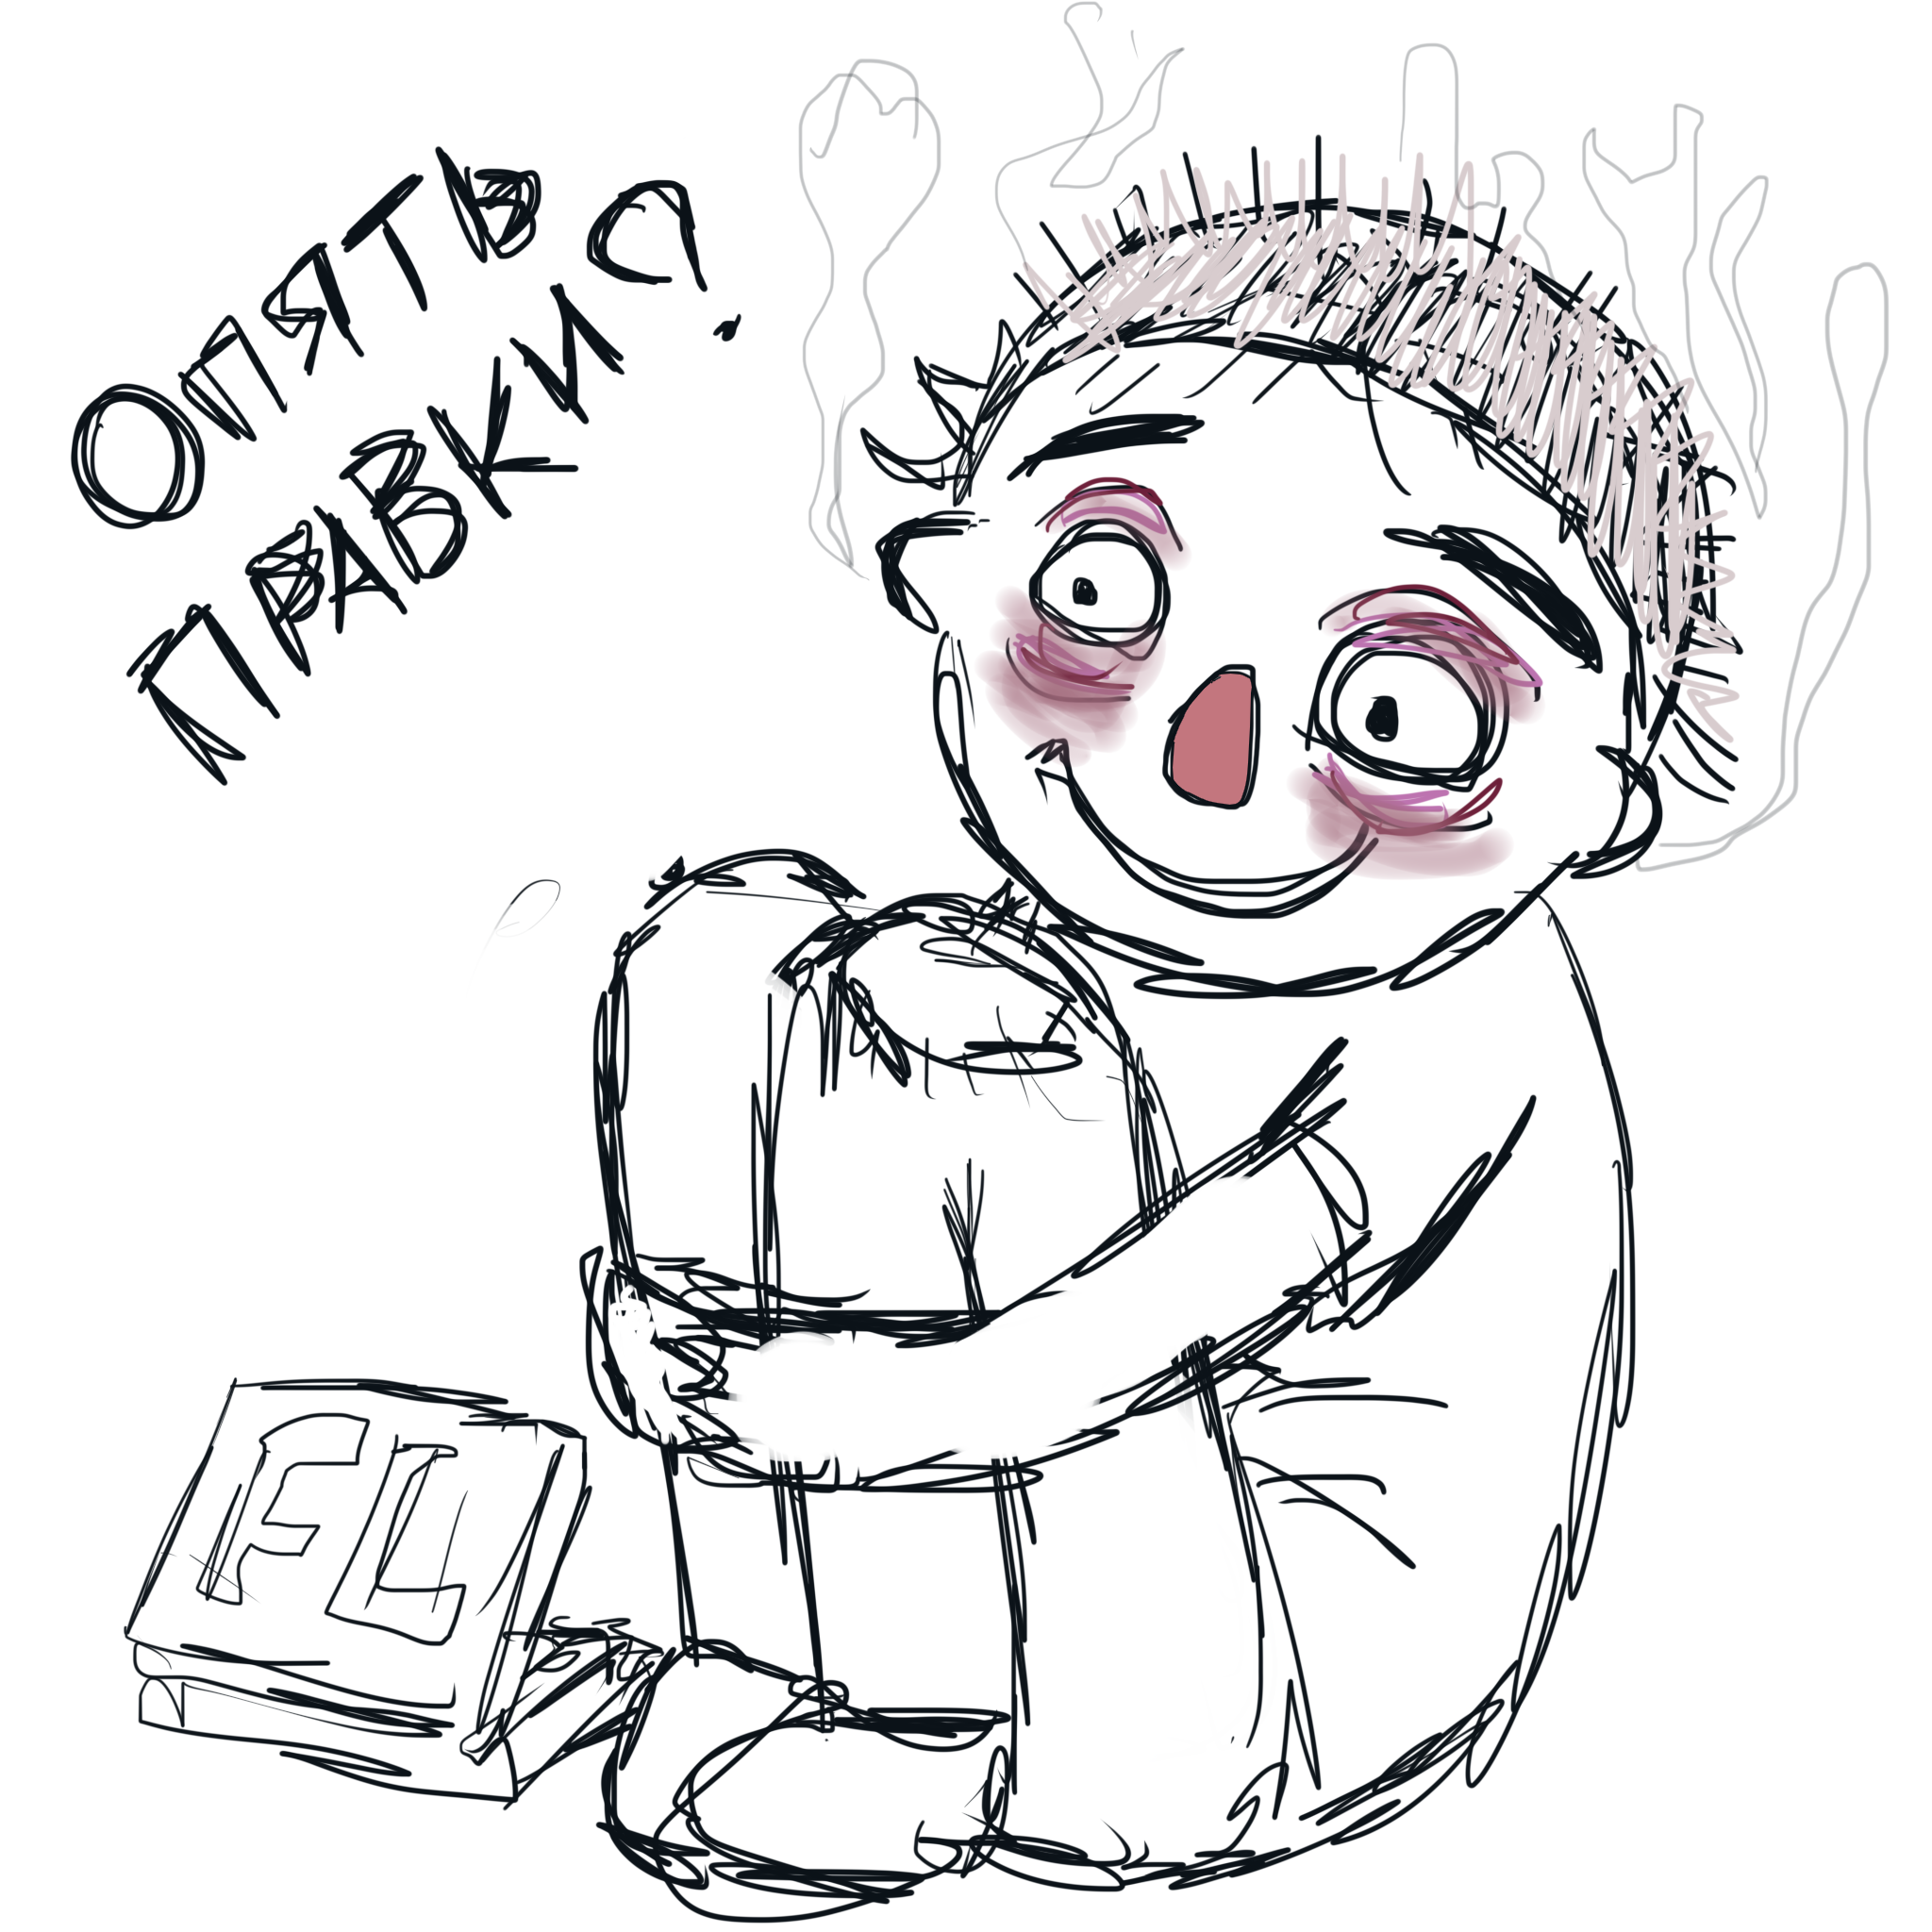 Стикерпаки на день фриланса для FL.ru фото f_6755cc5e8d1186cc.png